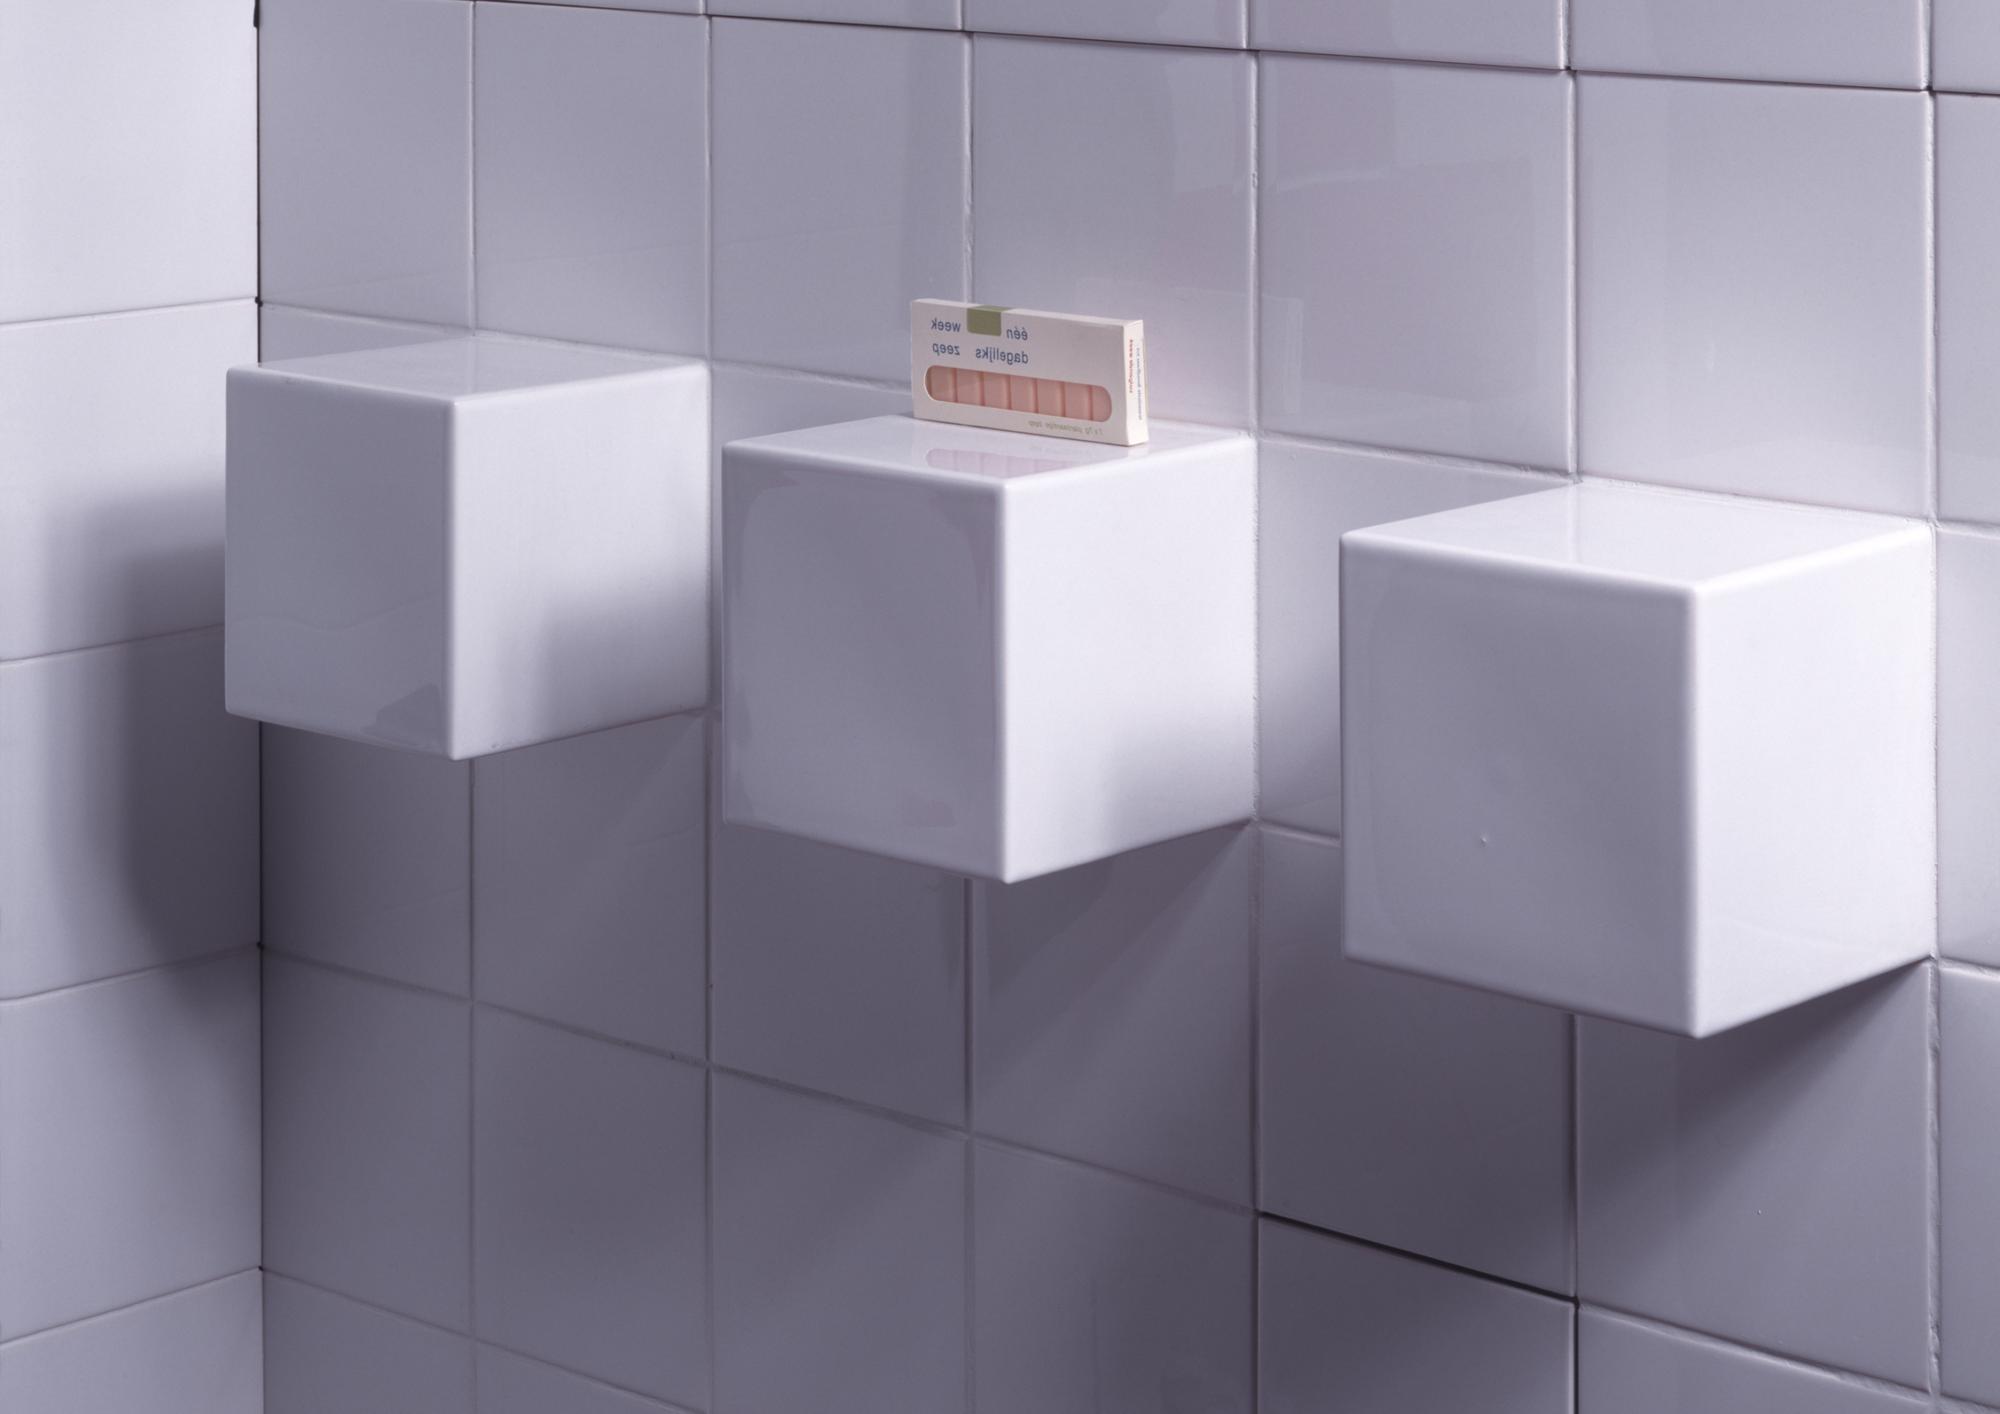 The Top 5 Hacks for Better Bathroom Organization